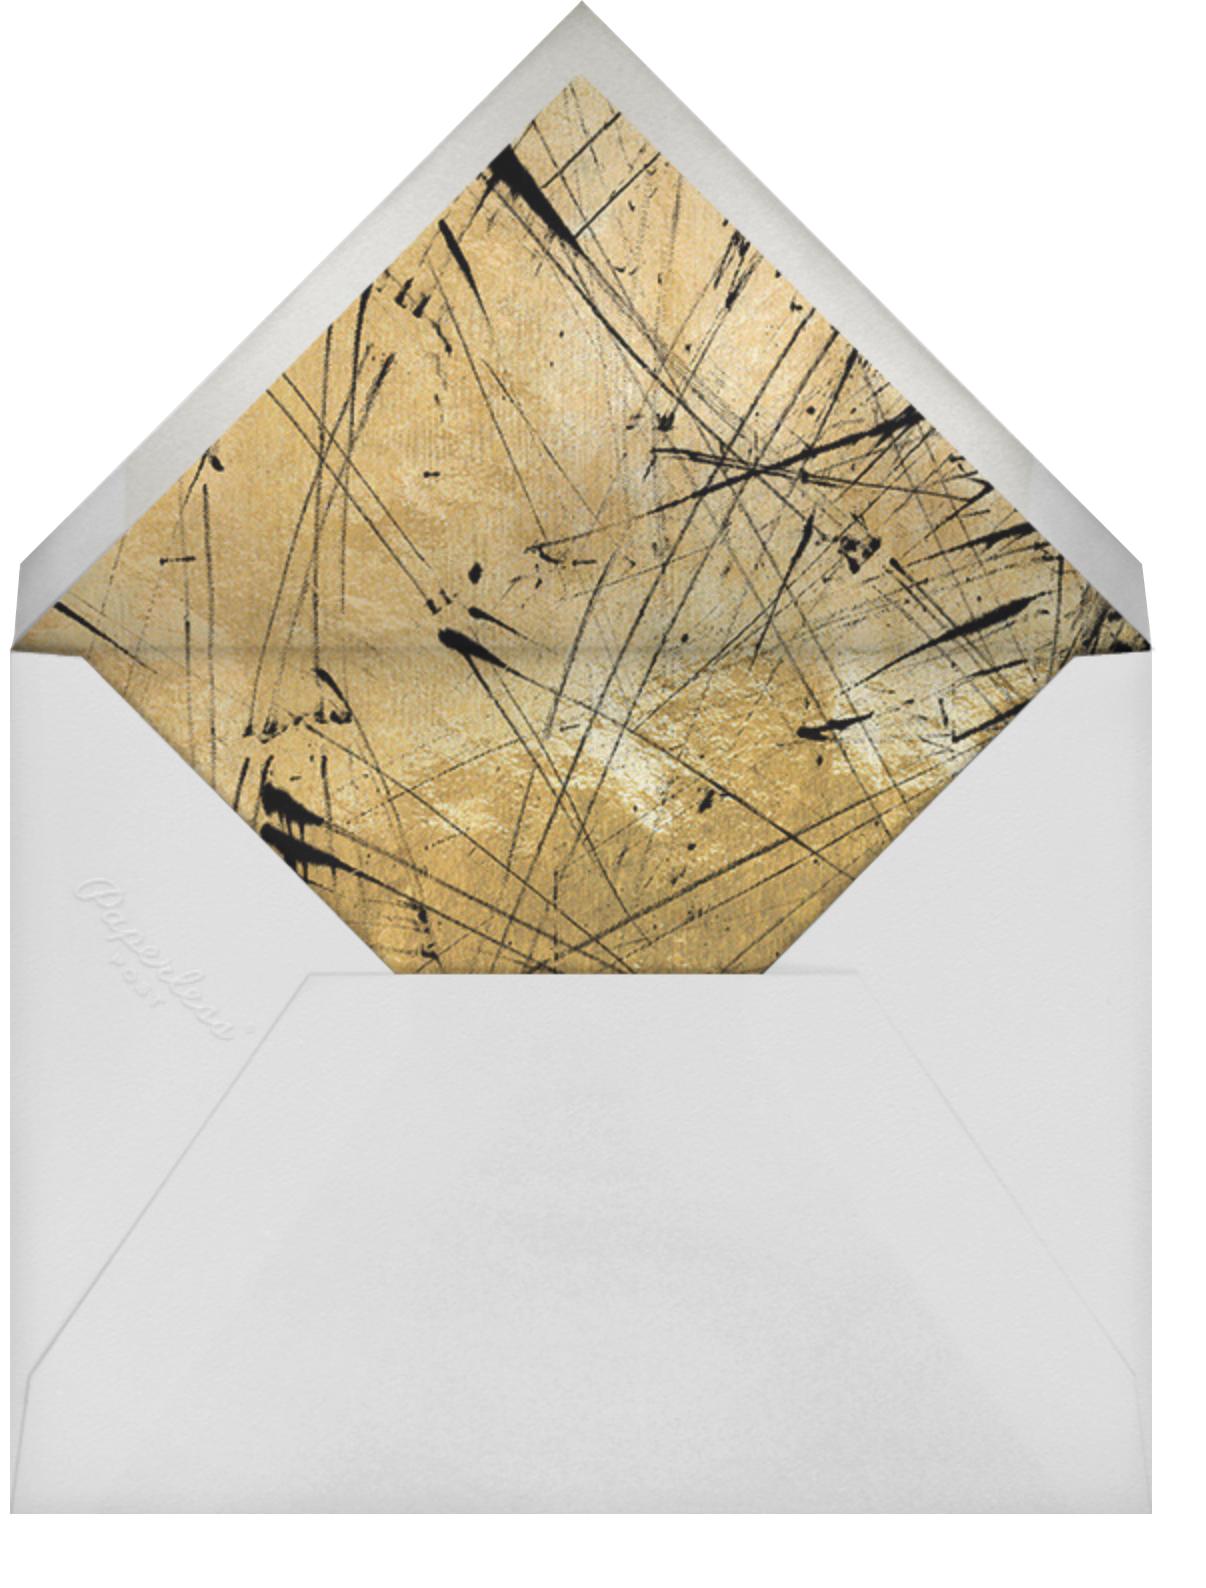 Mezzo Pearl - Black - Kelly Wearstler - Adult birthday - envelope back